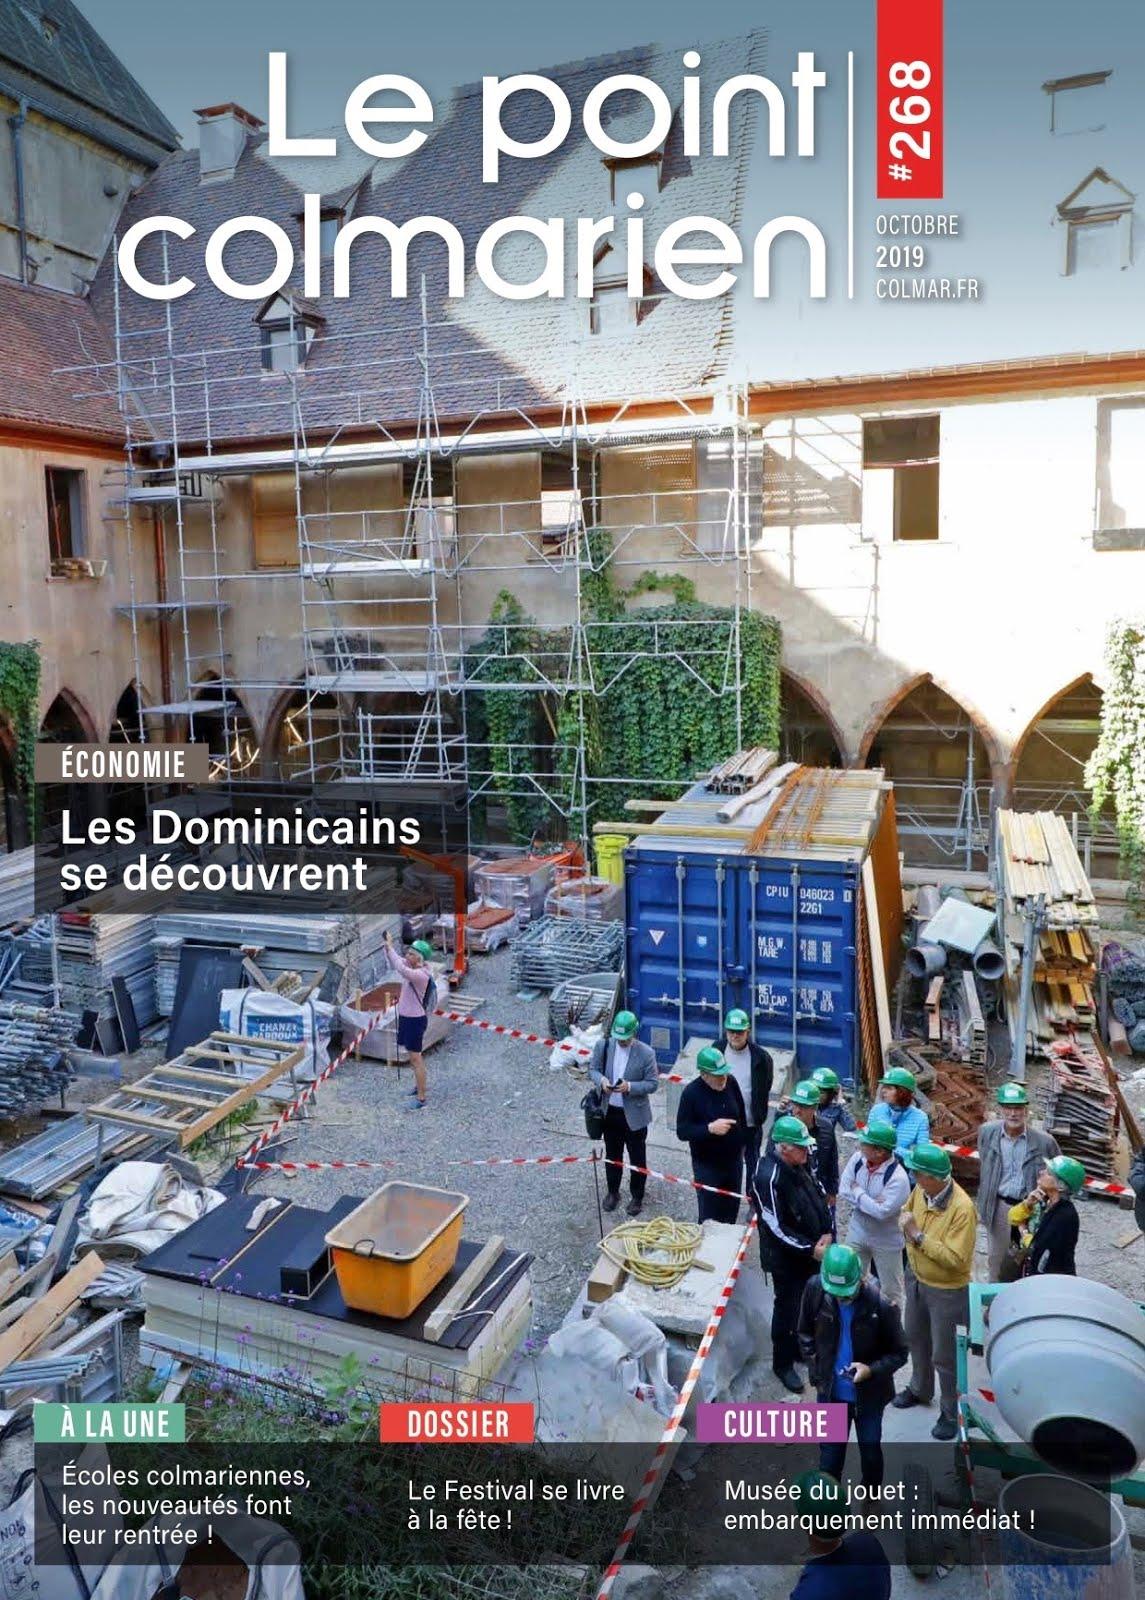 Le Point Colmarien  - Octobre 2019